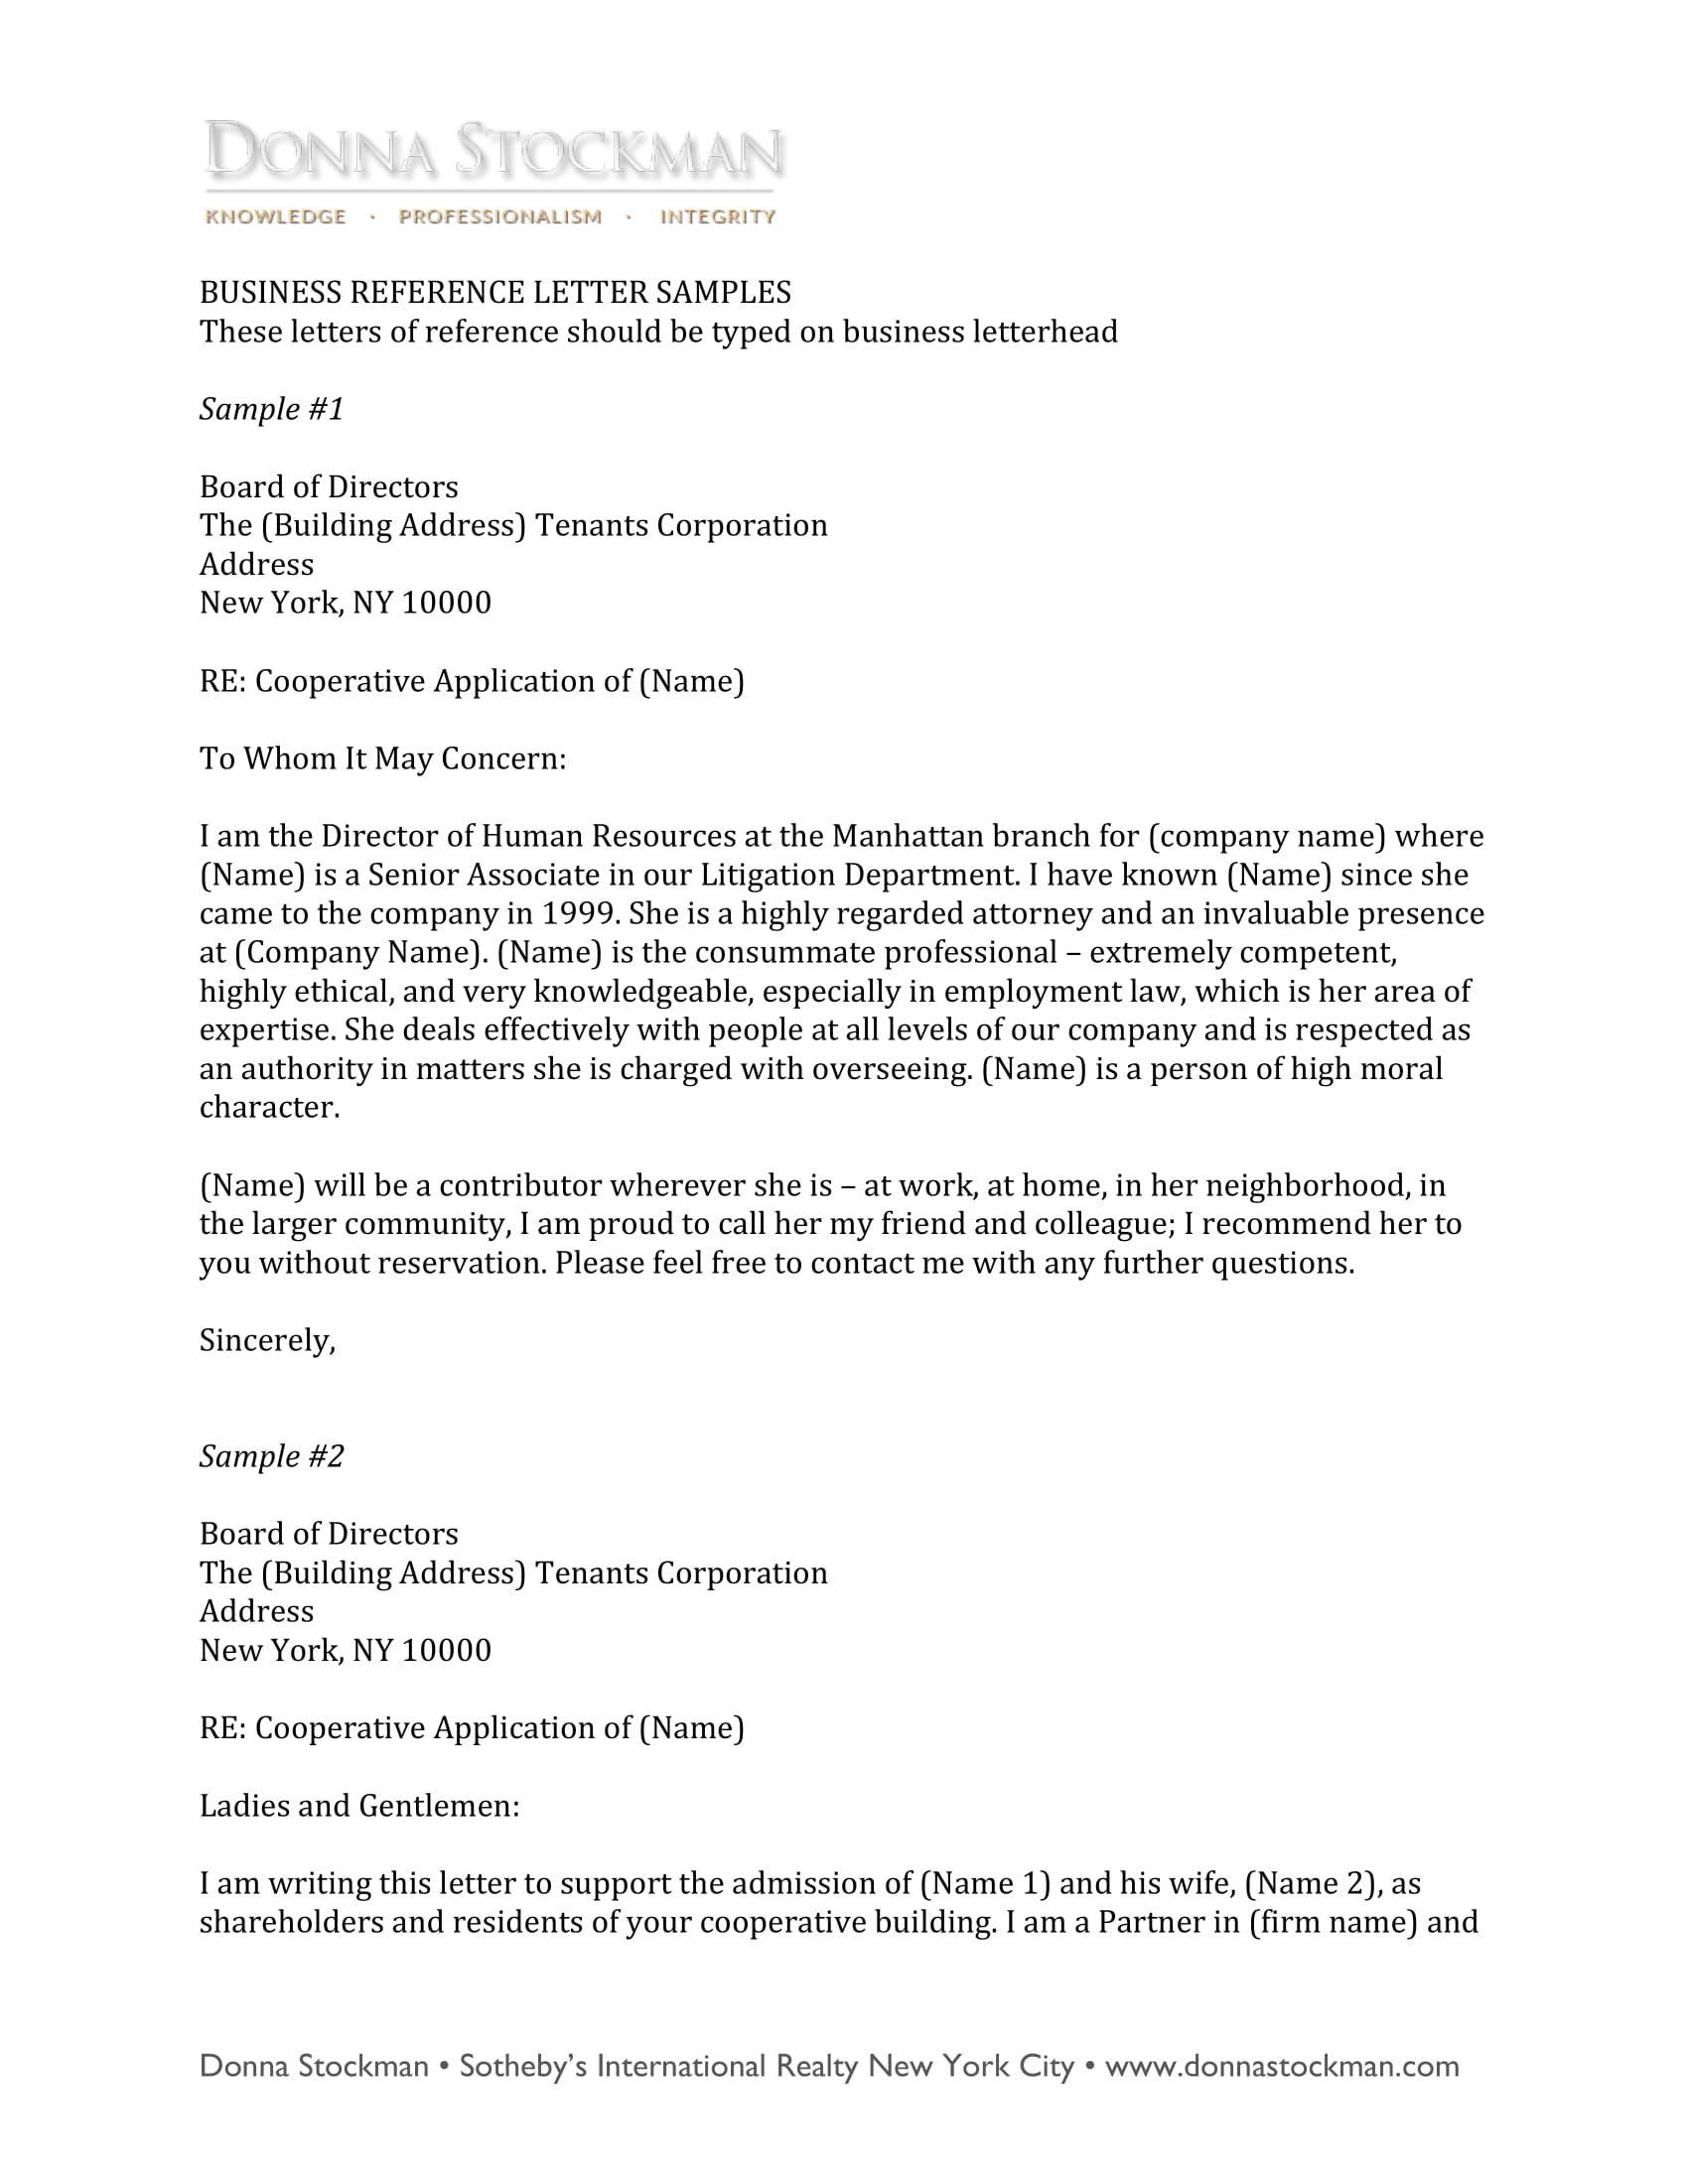 10+ business reference letter examples pdf radiologic technologist job description resume admin assistant cv format mechanical design engineer template